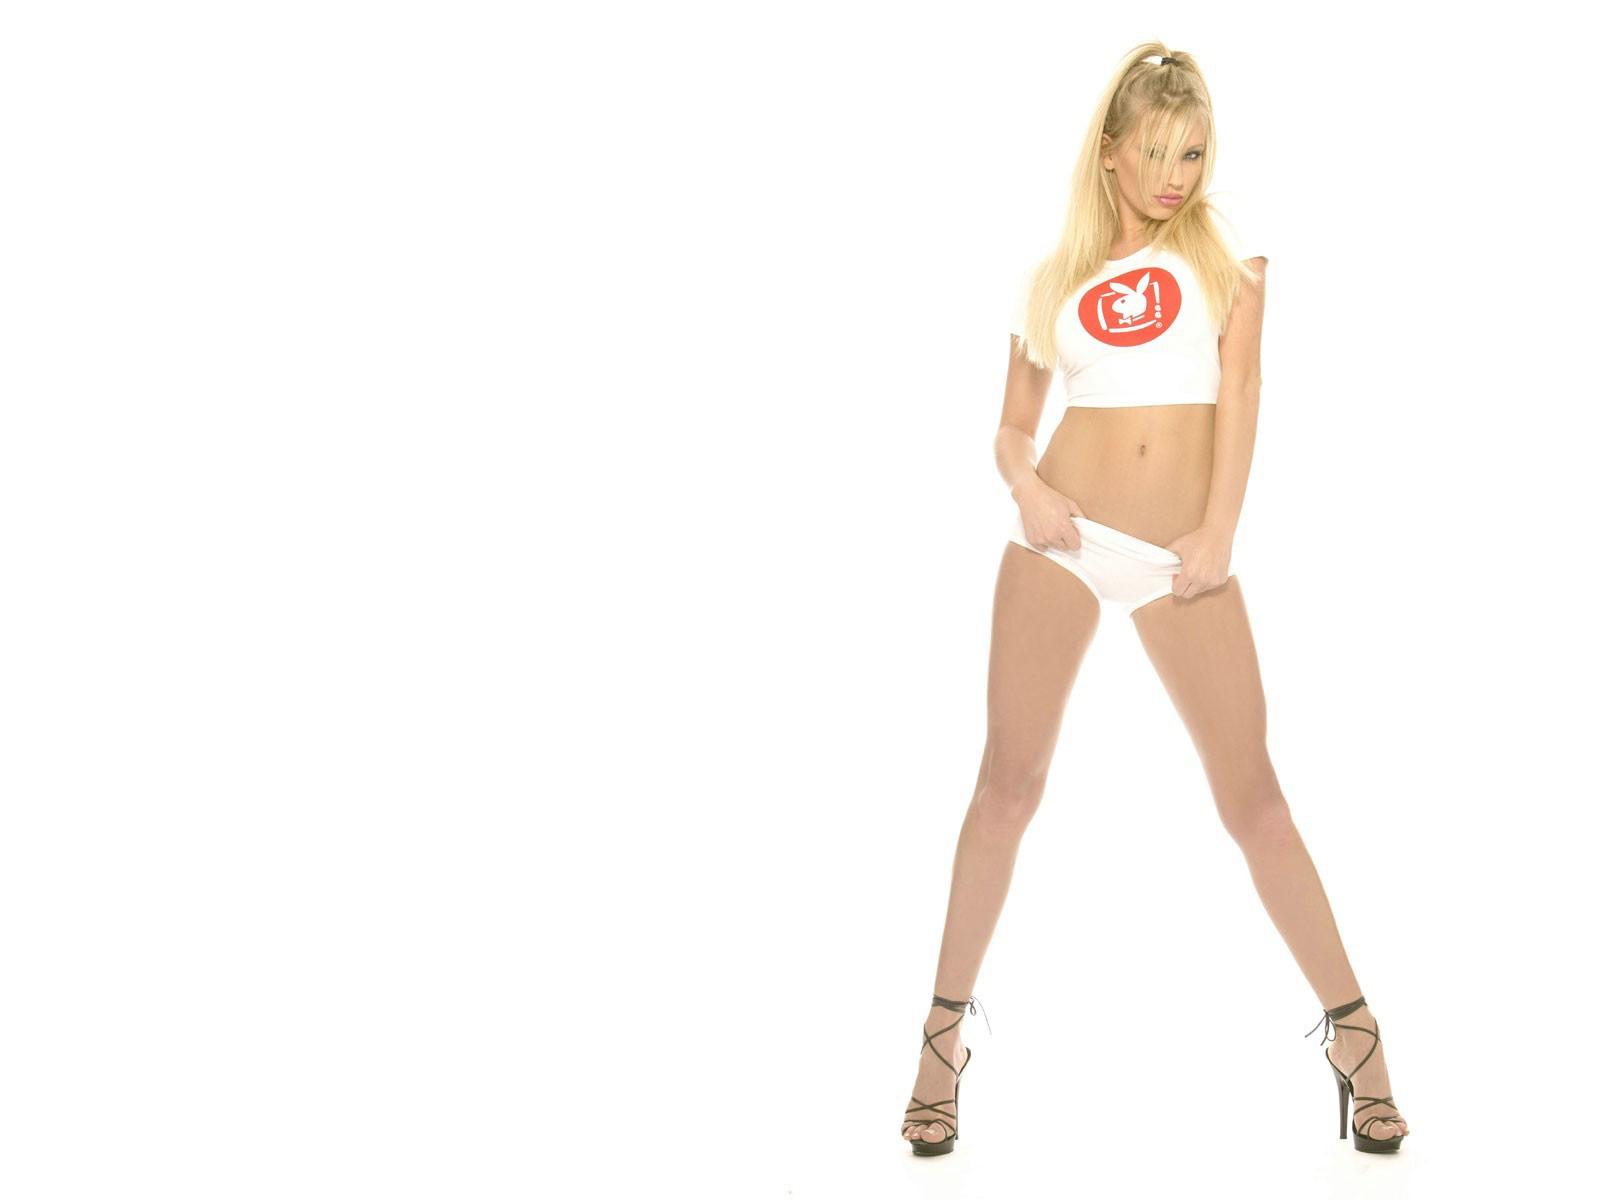 Playboy the mansion 3d nackt image